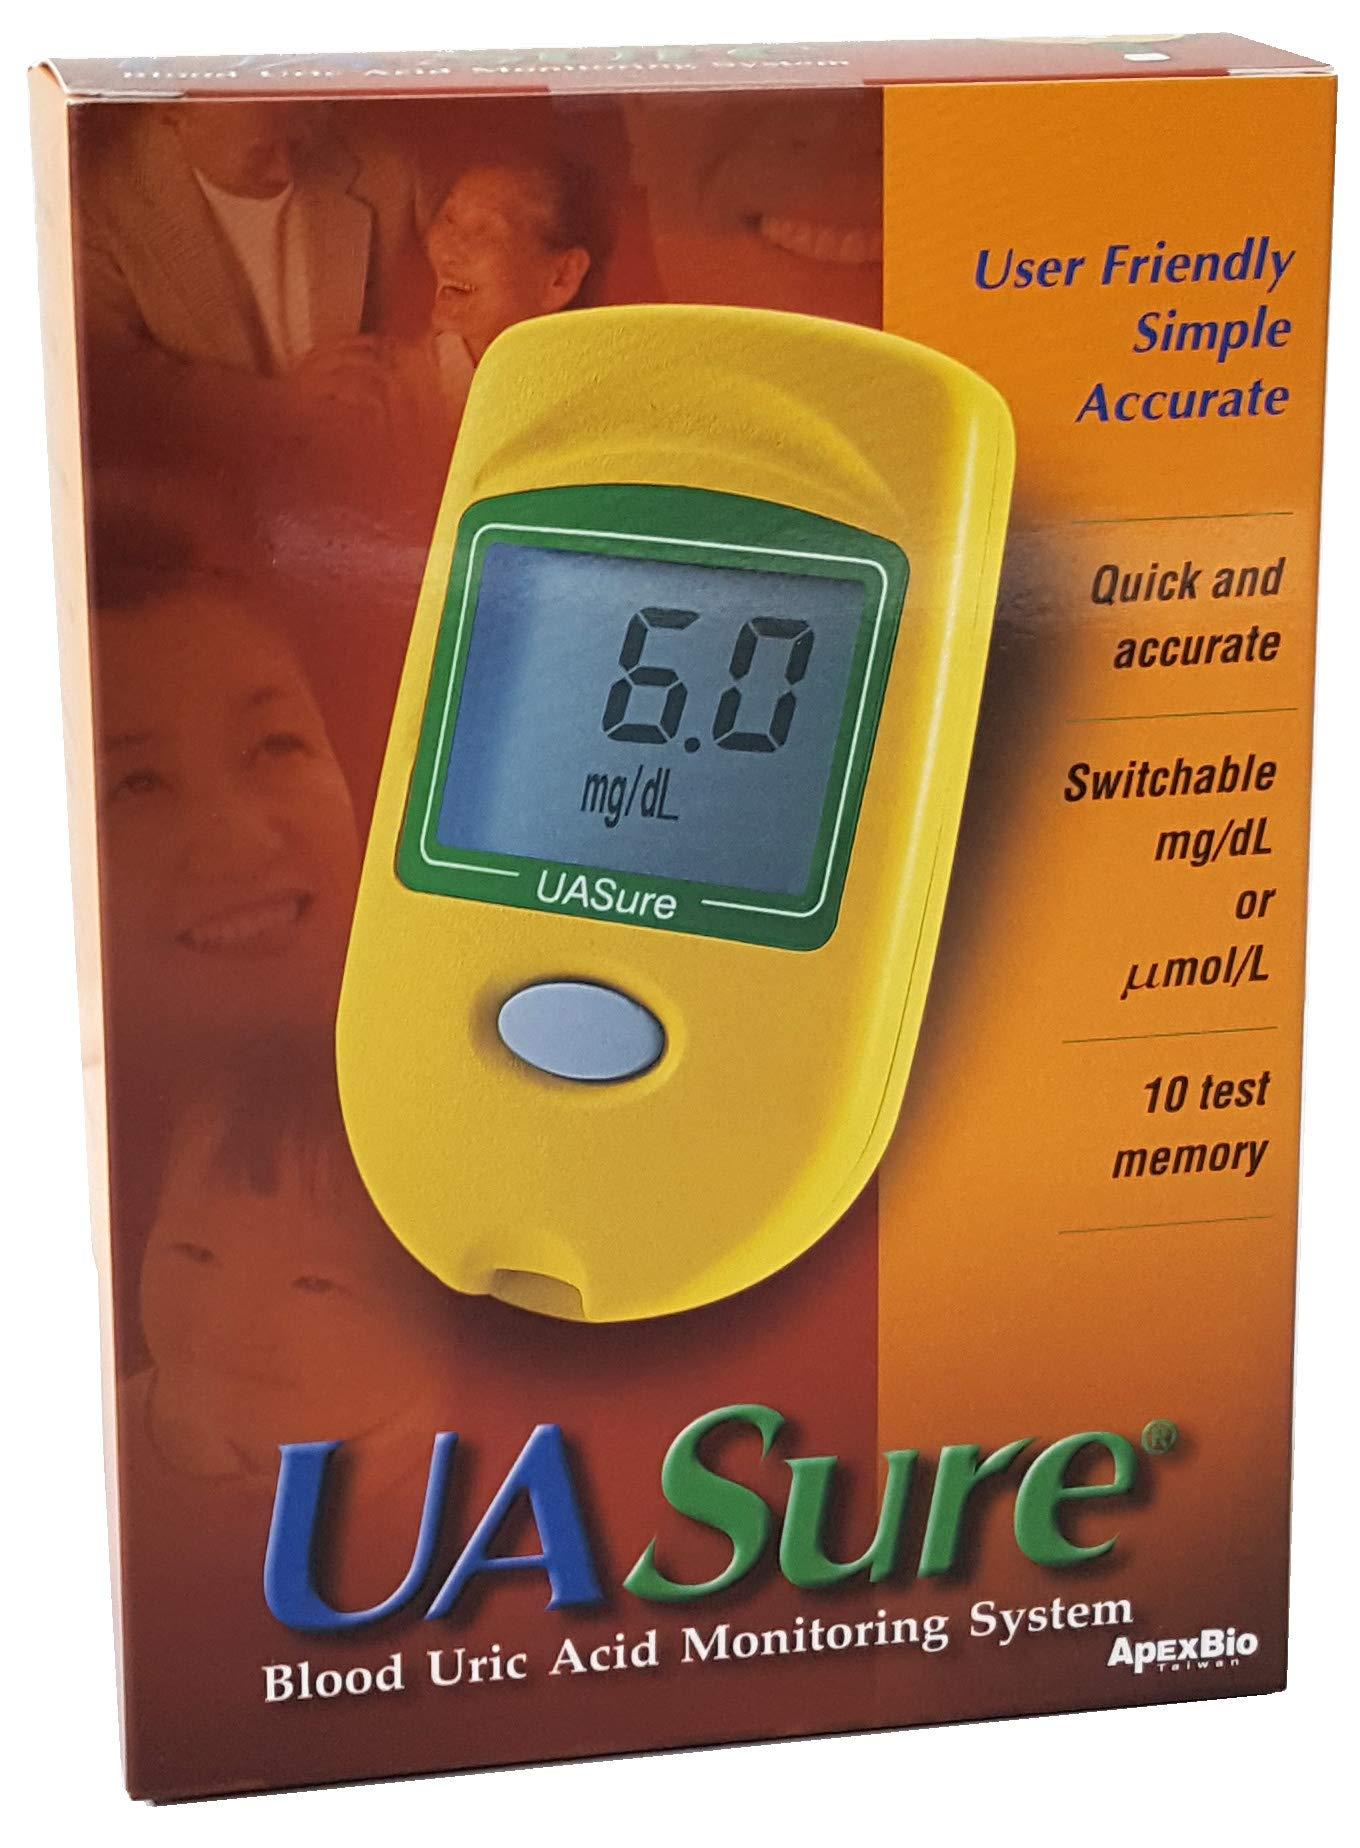 UASure Uric Acid Meter - UA Sure Test Kit - Gout Monitor Tester - Complete Kit - Includes 30 Test Strips